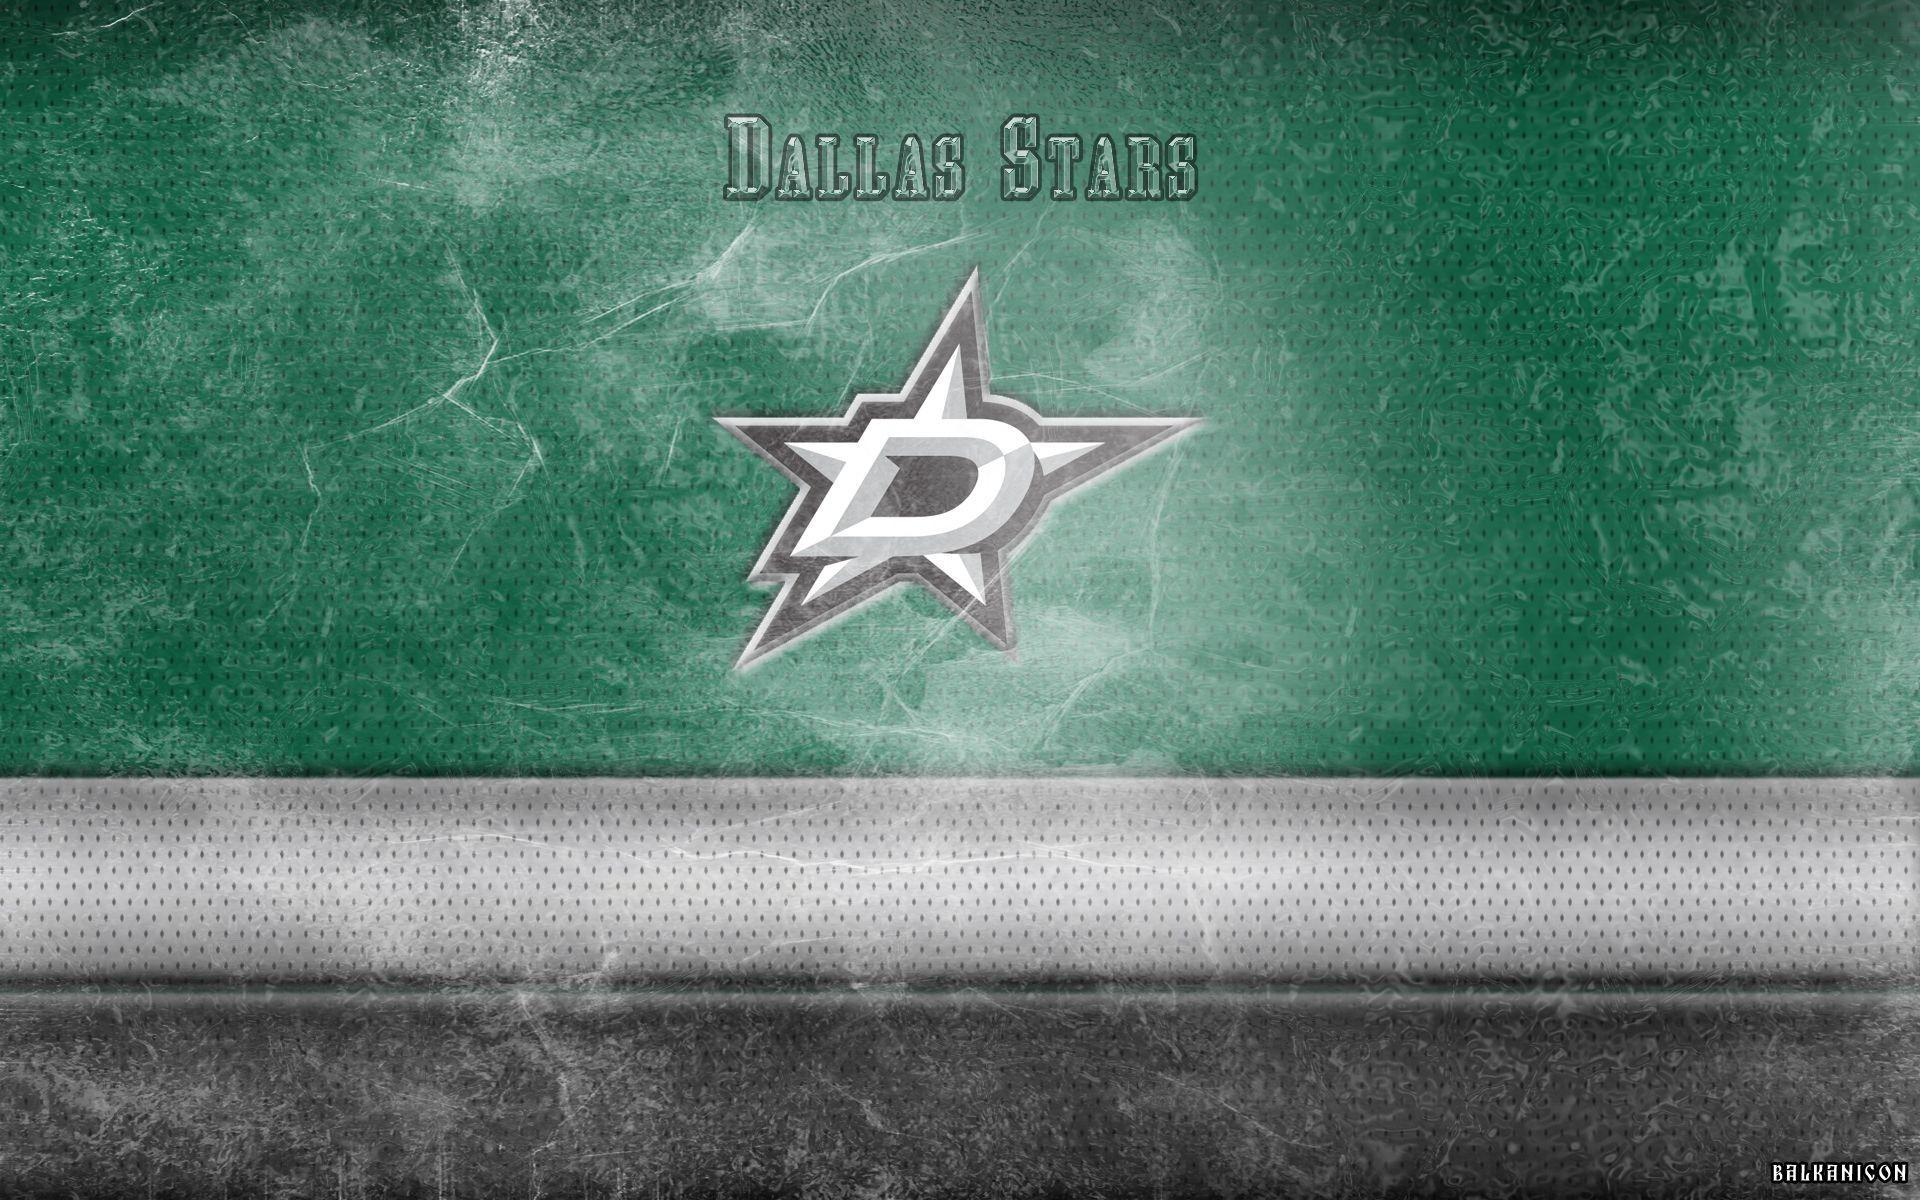 Dallas Stars Background Wallpaper – WallpaperSafari